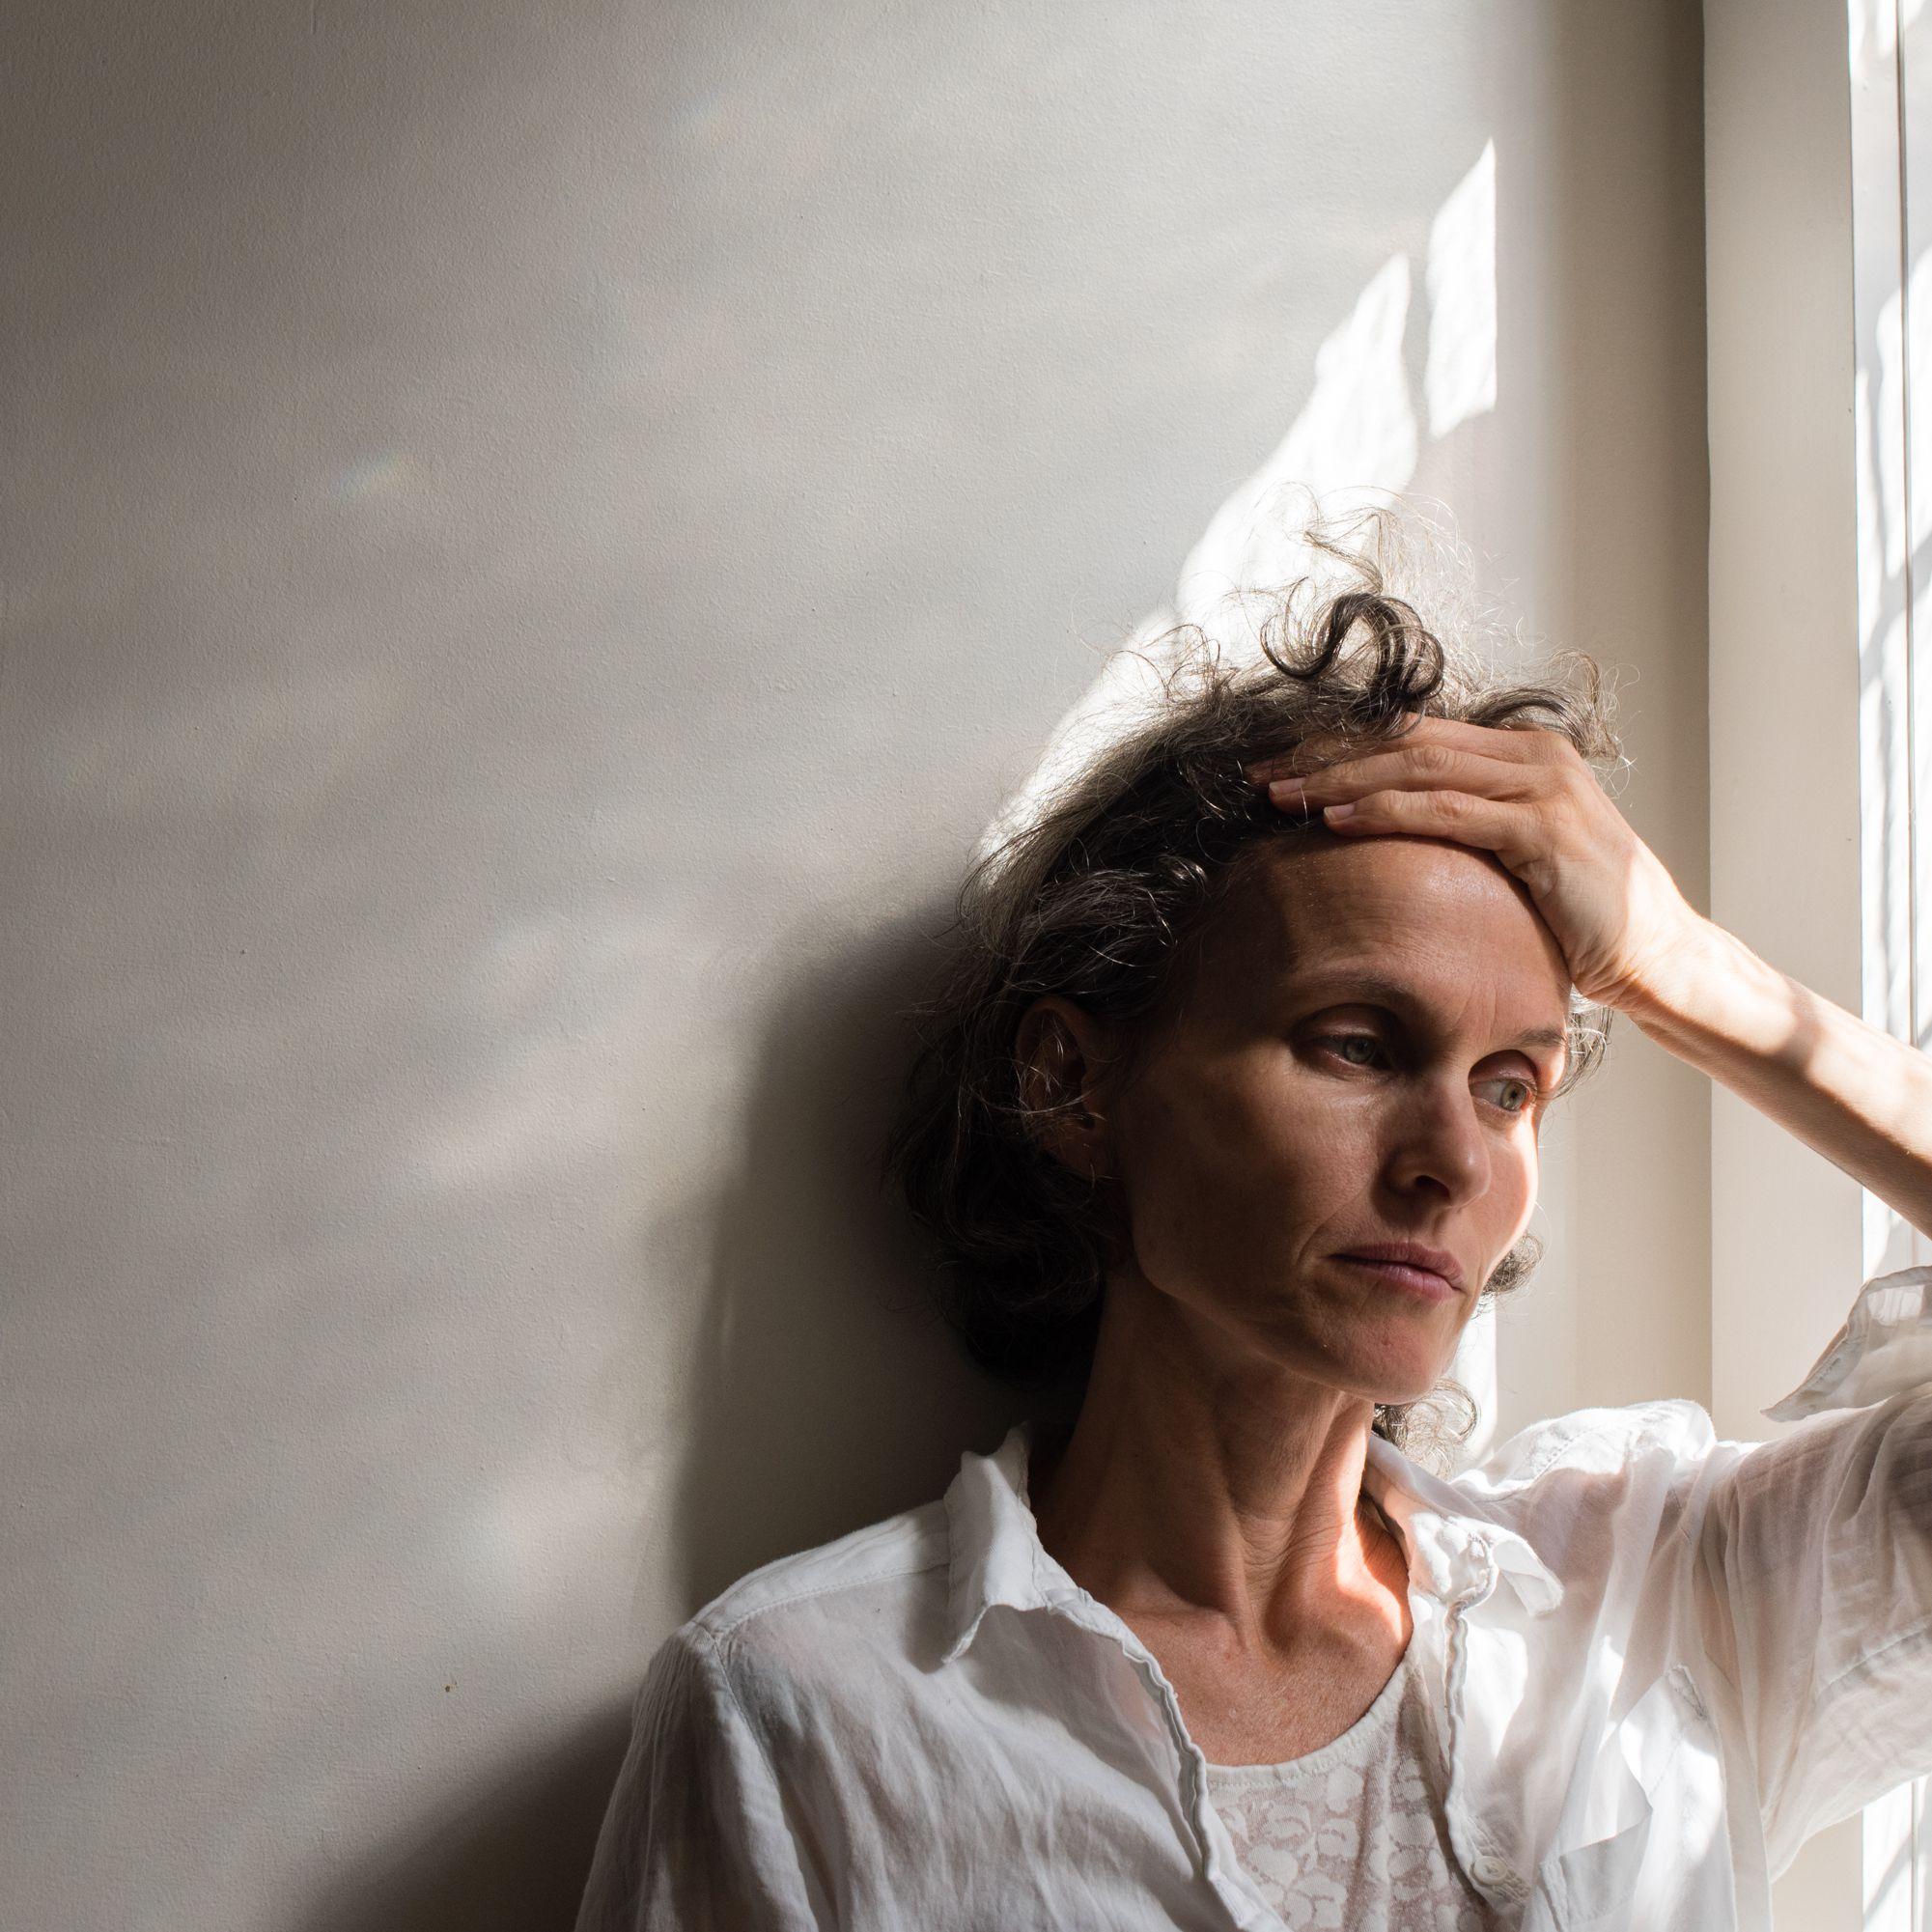 Wellbutrin Withdrawal: Symptoms, Timeline, Treatment